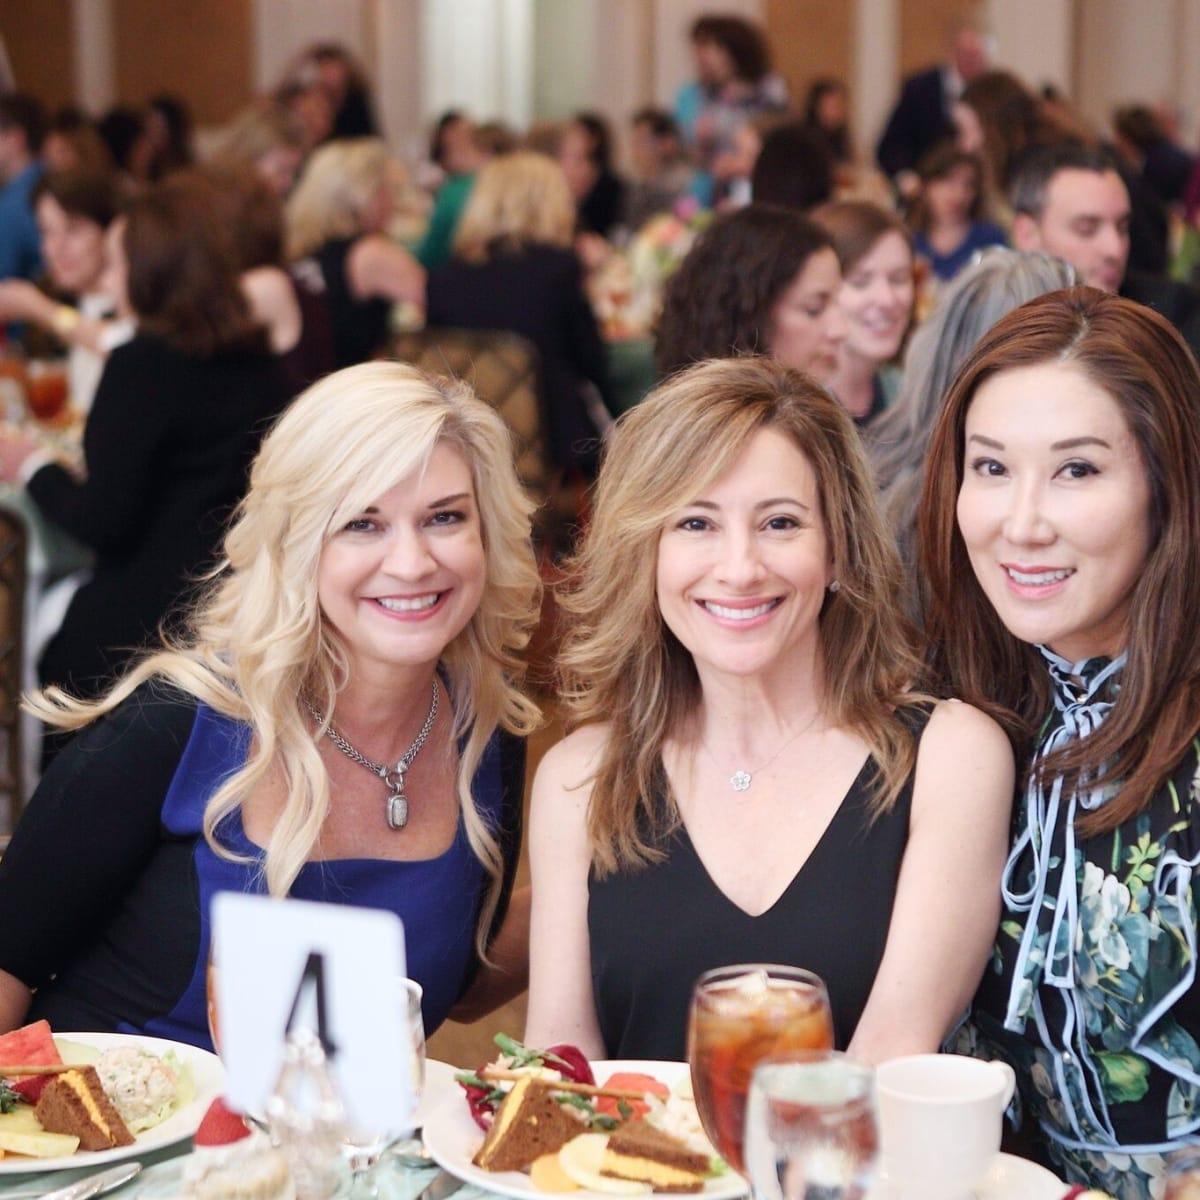 ChildBuilders luncheon Tammie Johnson, Dena Winkler and Mandy Kao